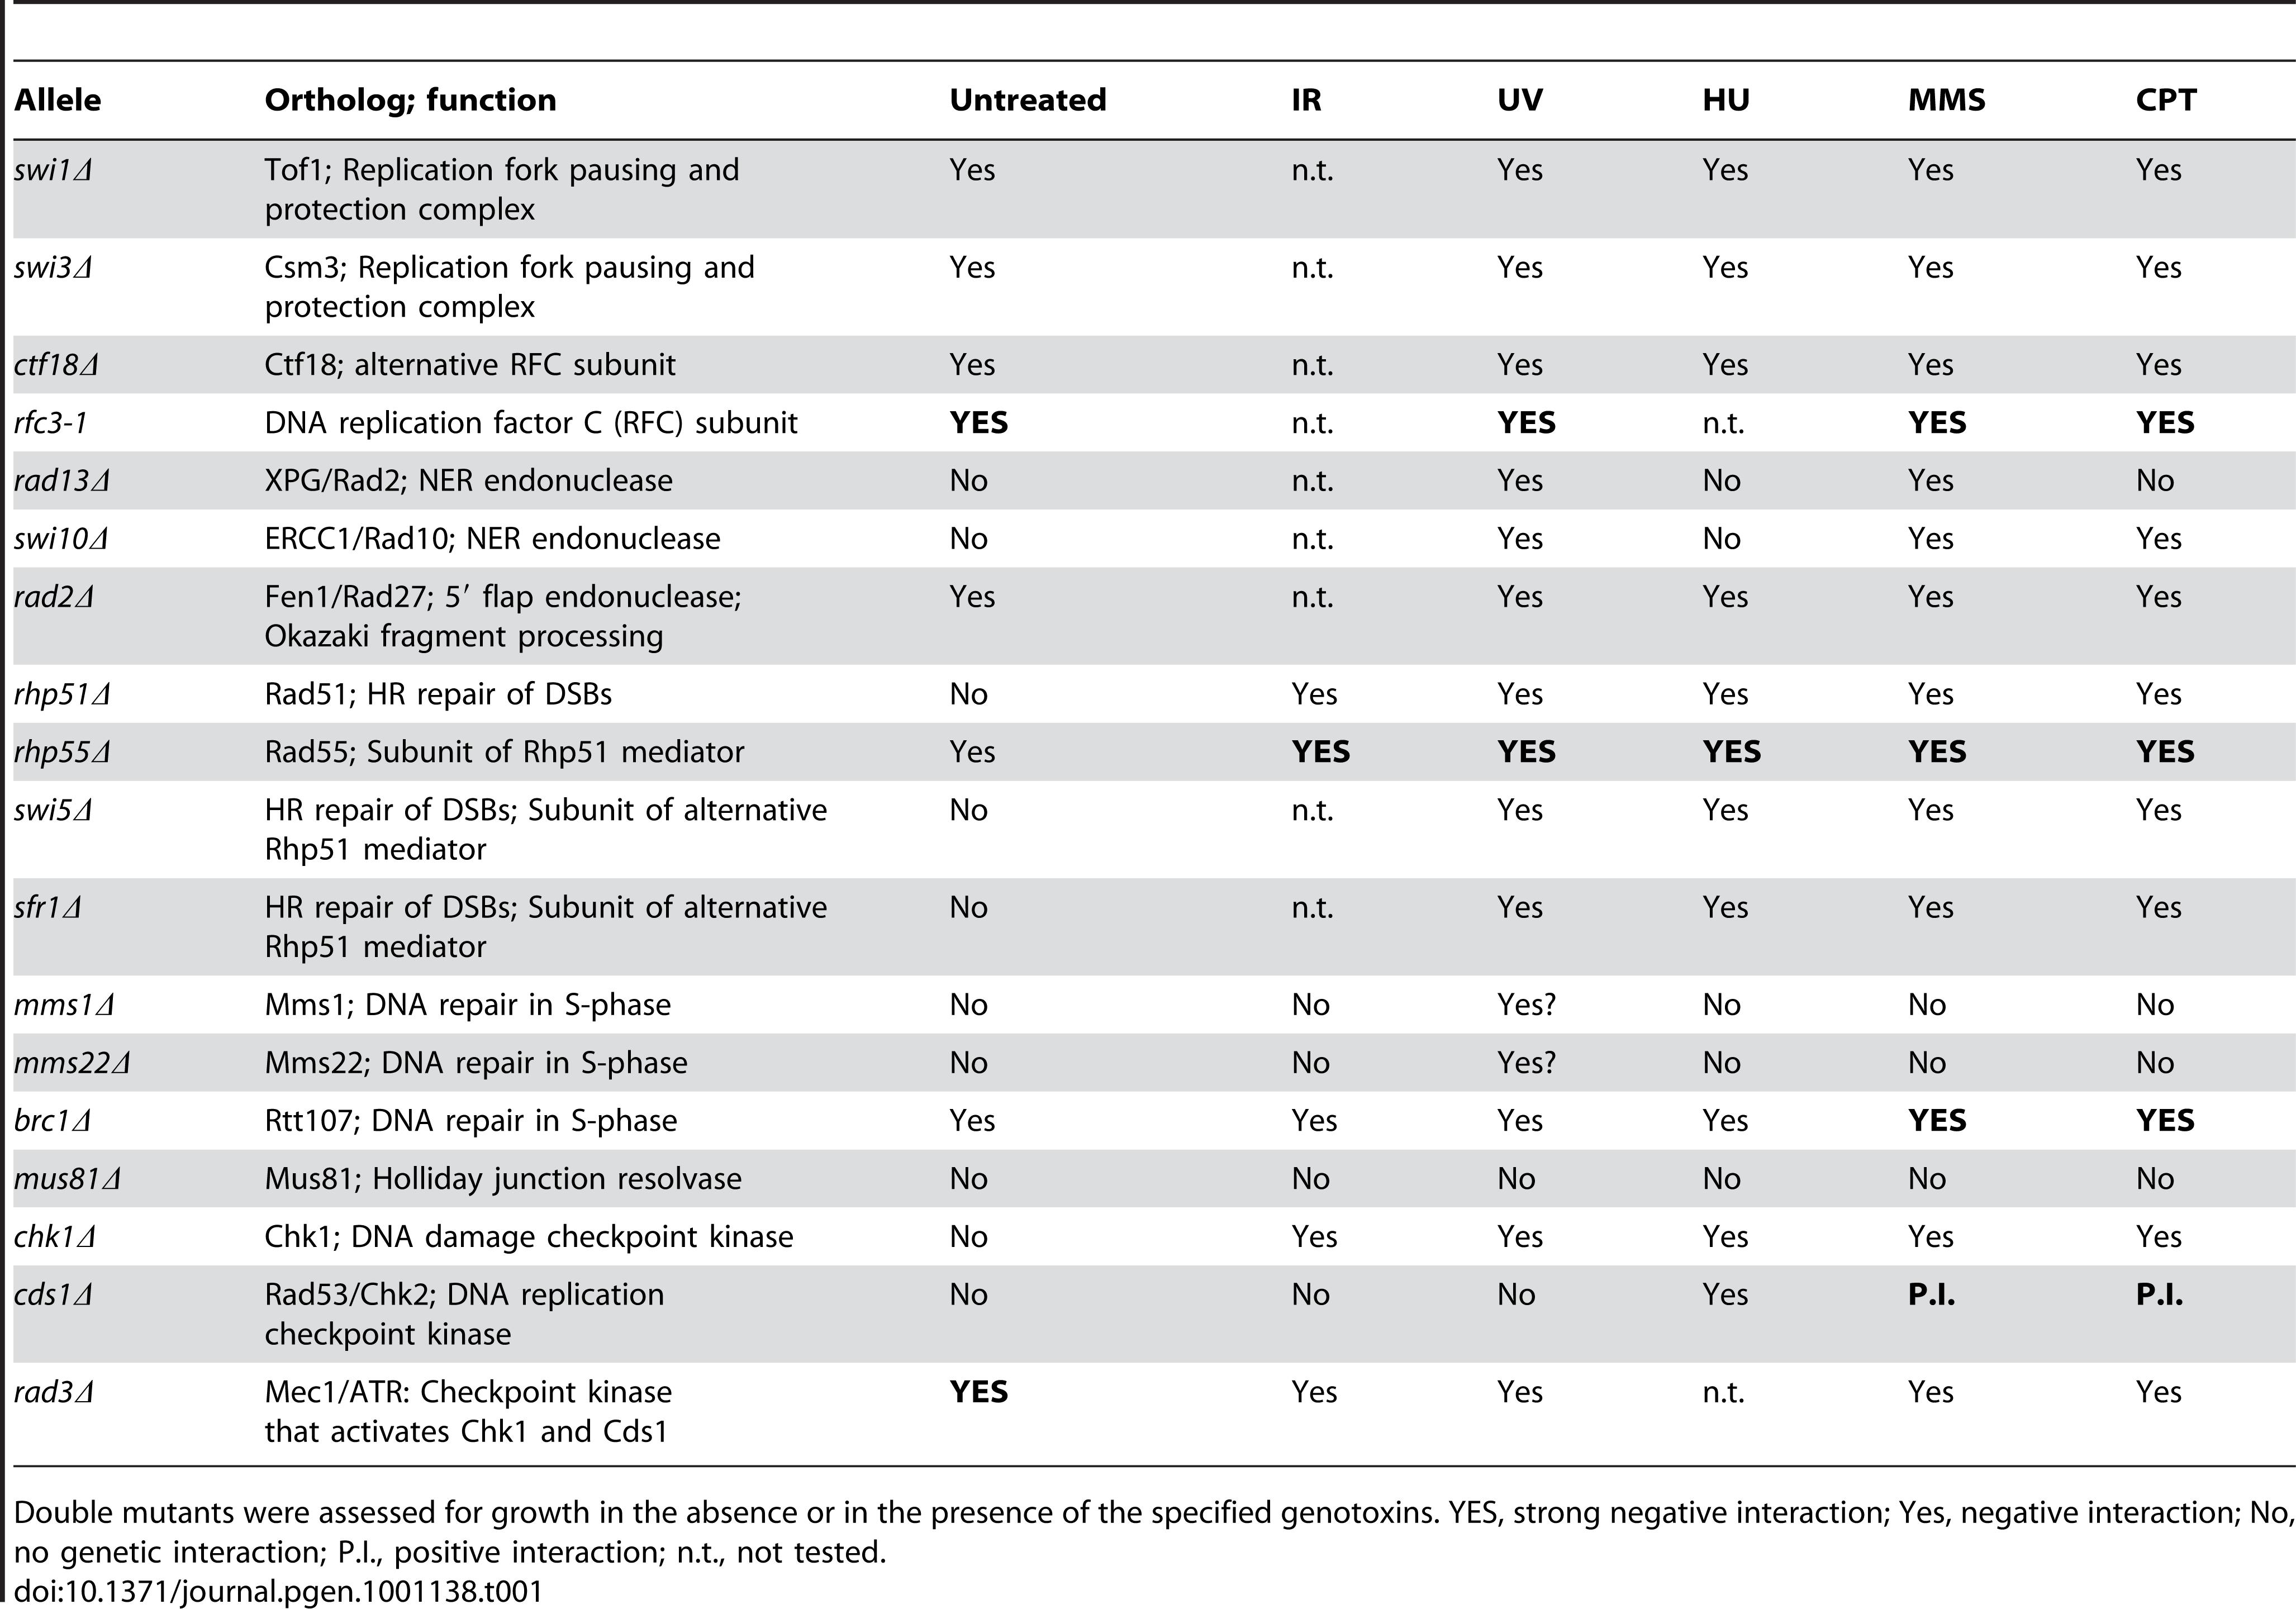 Summary of genetic interactions involving <i>ssb3Δ</i>.